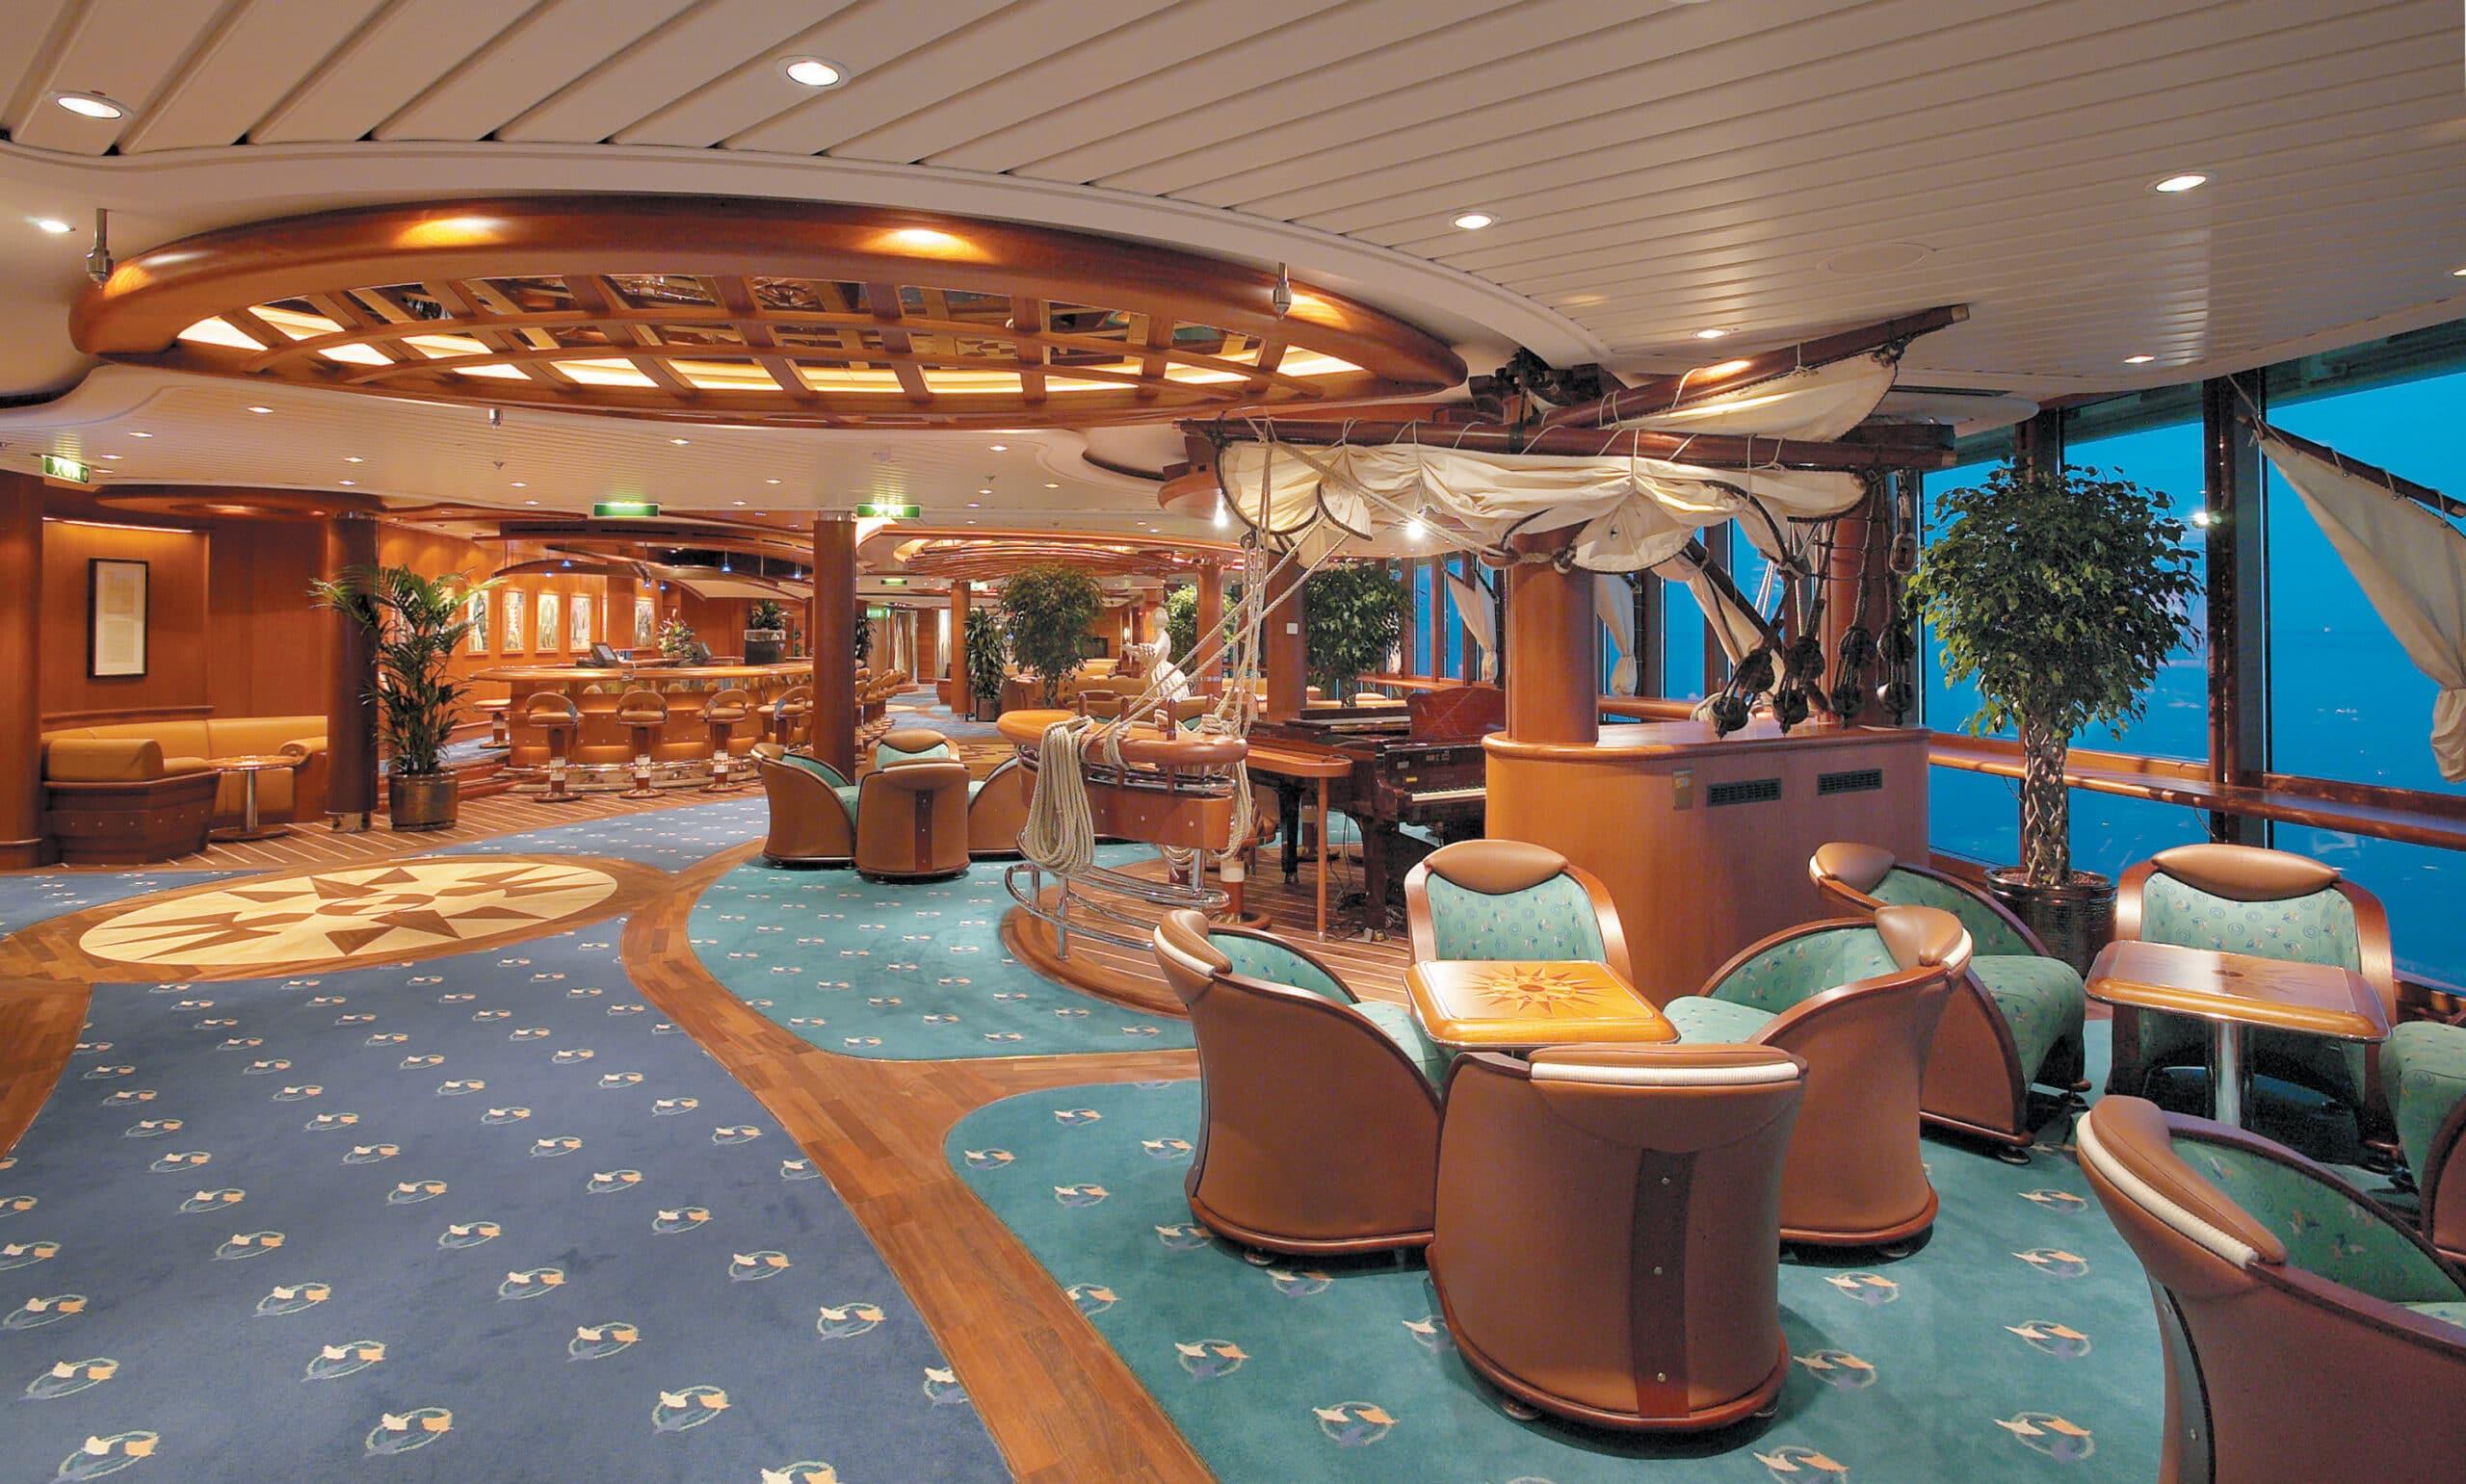 Cruiseschip-Jewel of the Seas-Royal Caribbean International-SchoonerBar